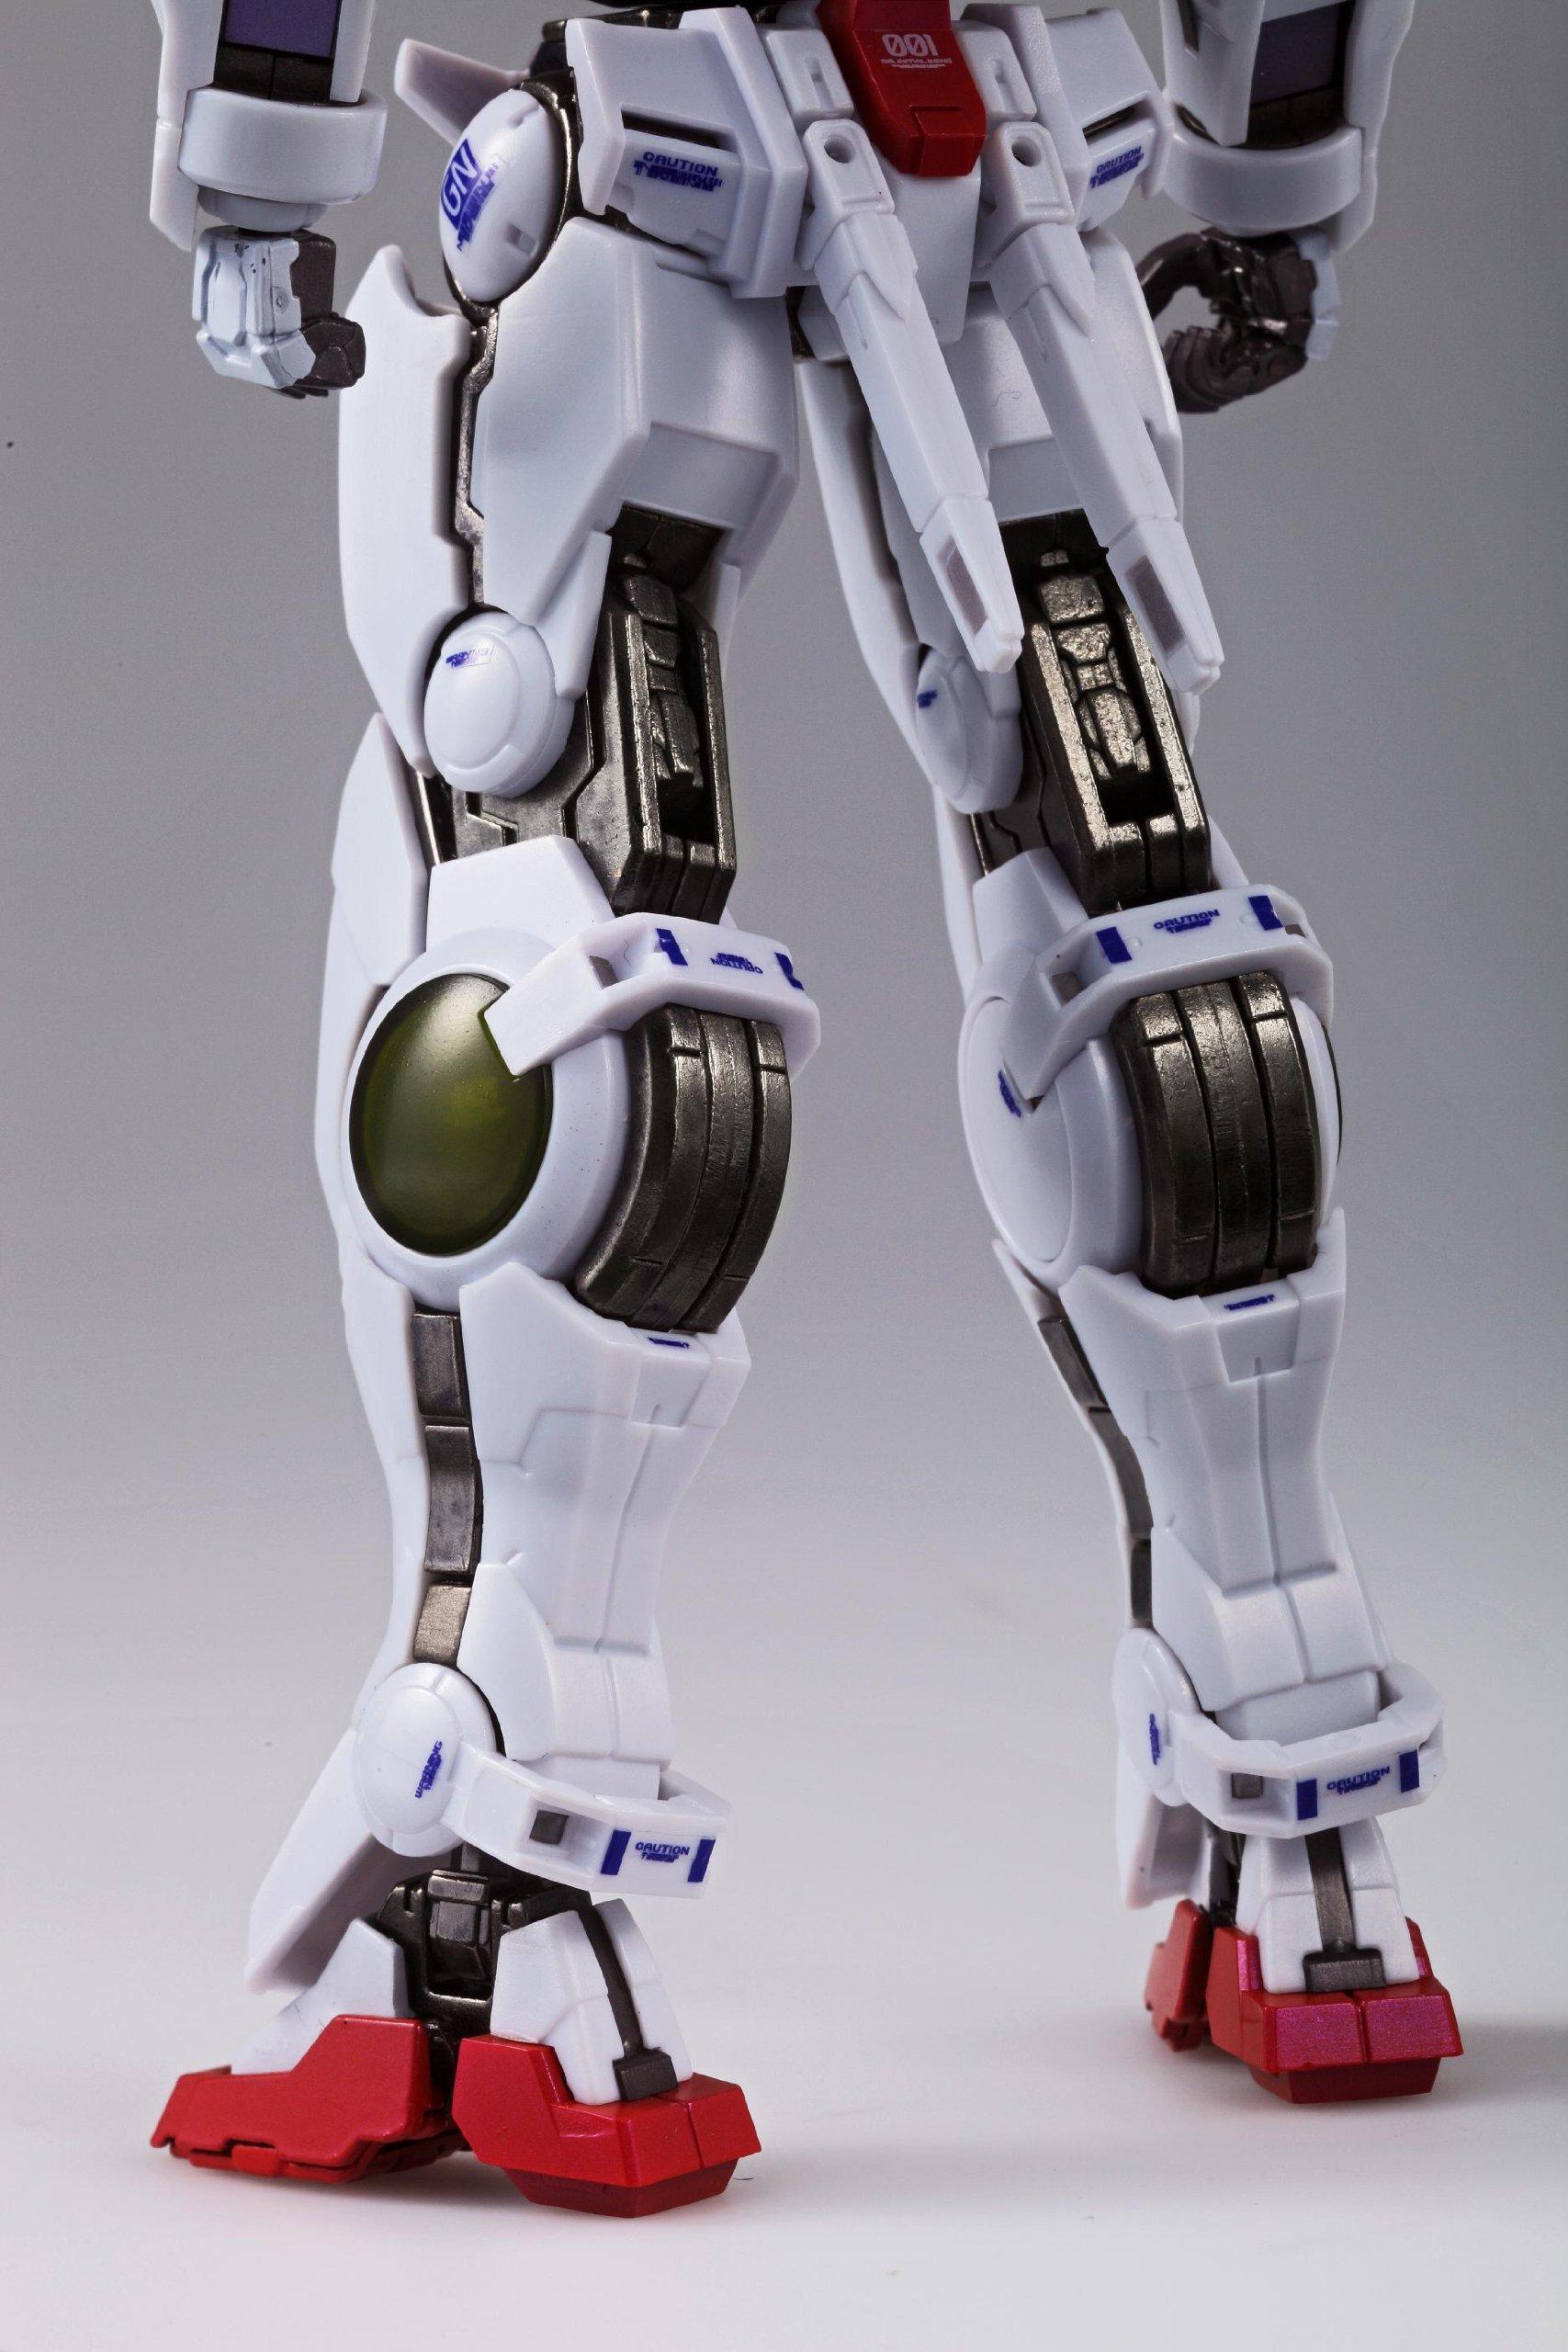 Metal Build 1 100 Gundam Exia Amp Exia Repair Iii Full English Description No 9 Poster Size